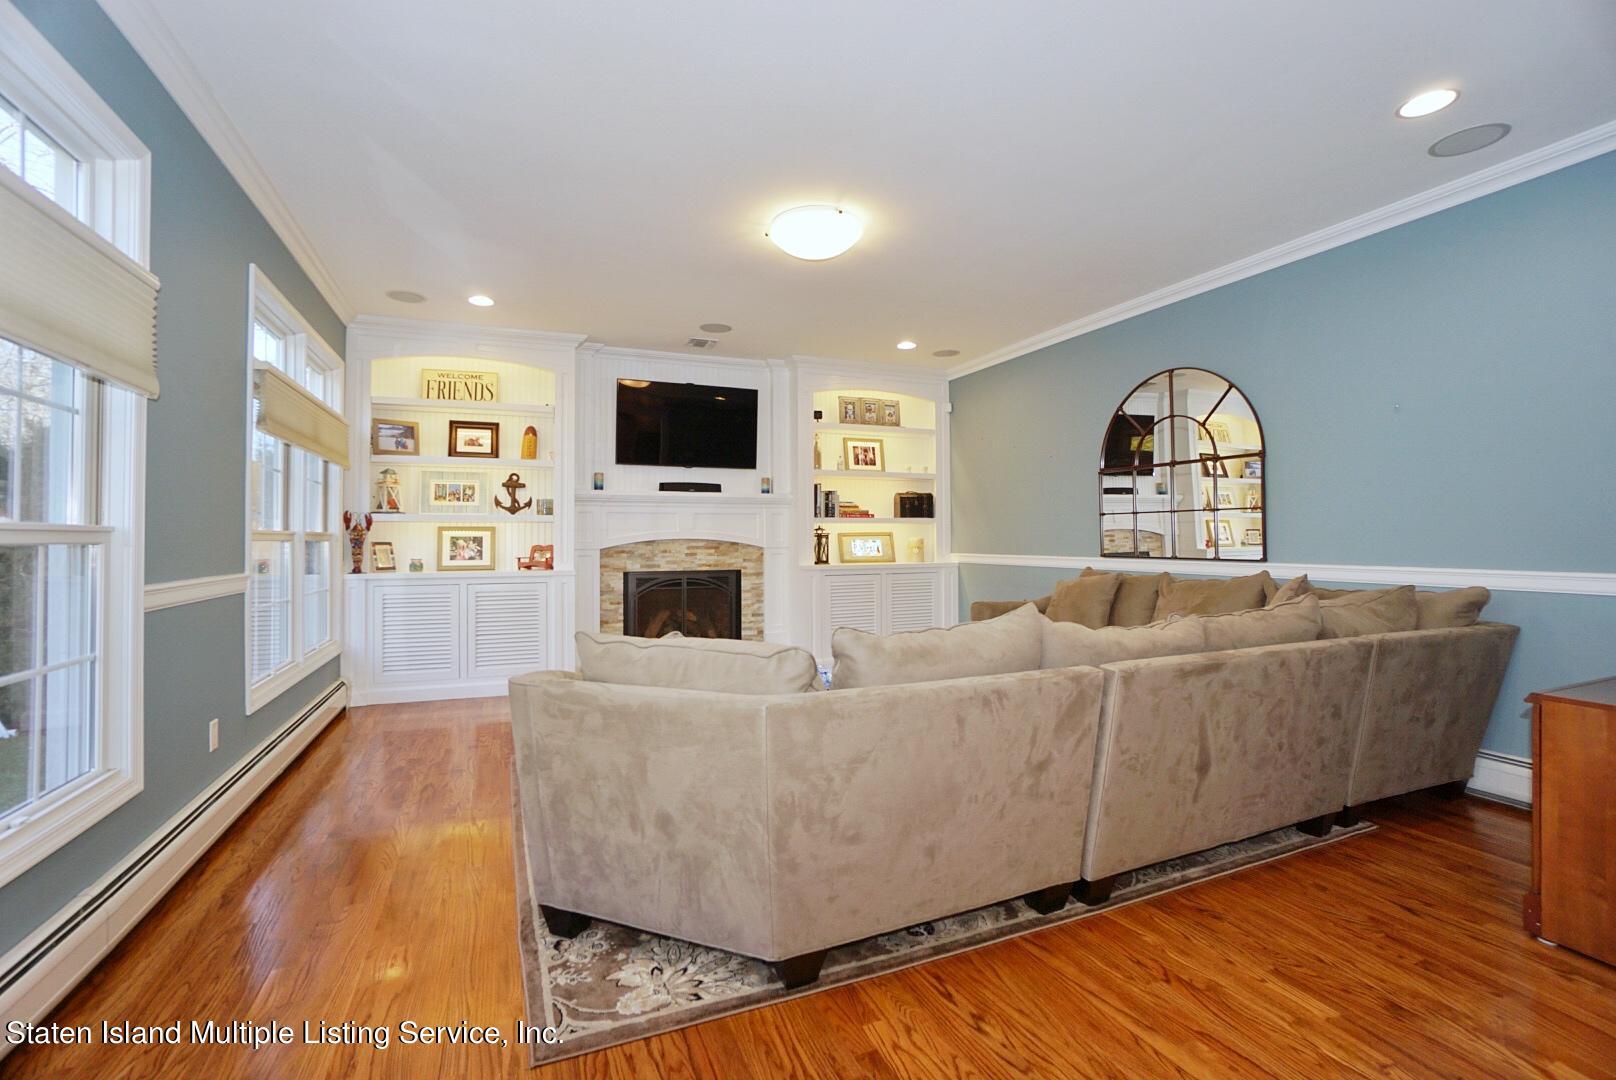 Single Family - Detached 31 Belwood Loop  Staten Island, NY 10307, MLS-1143133-15